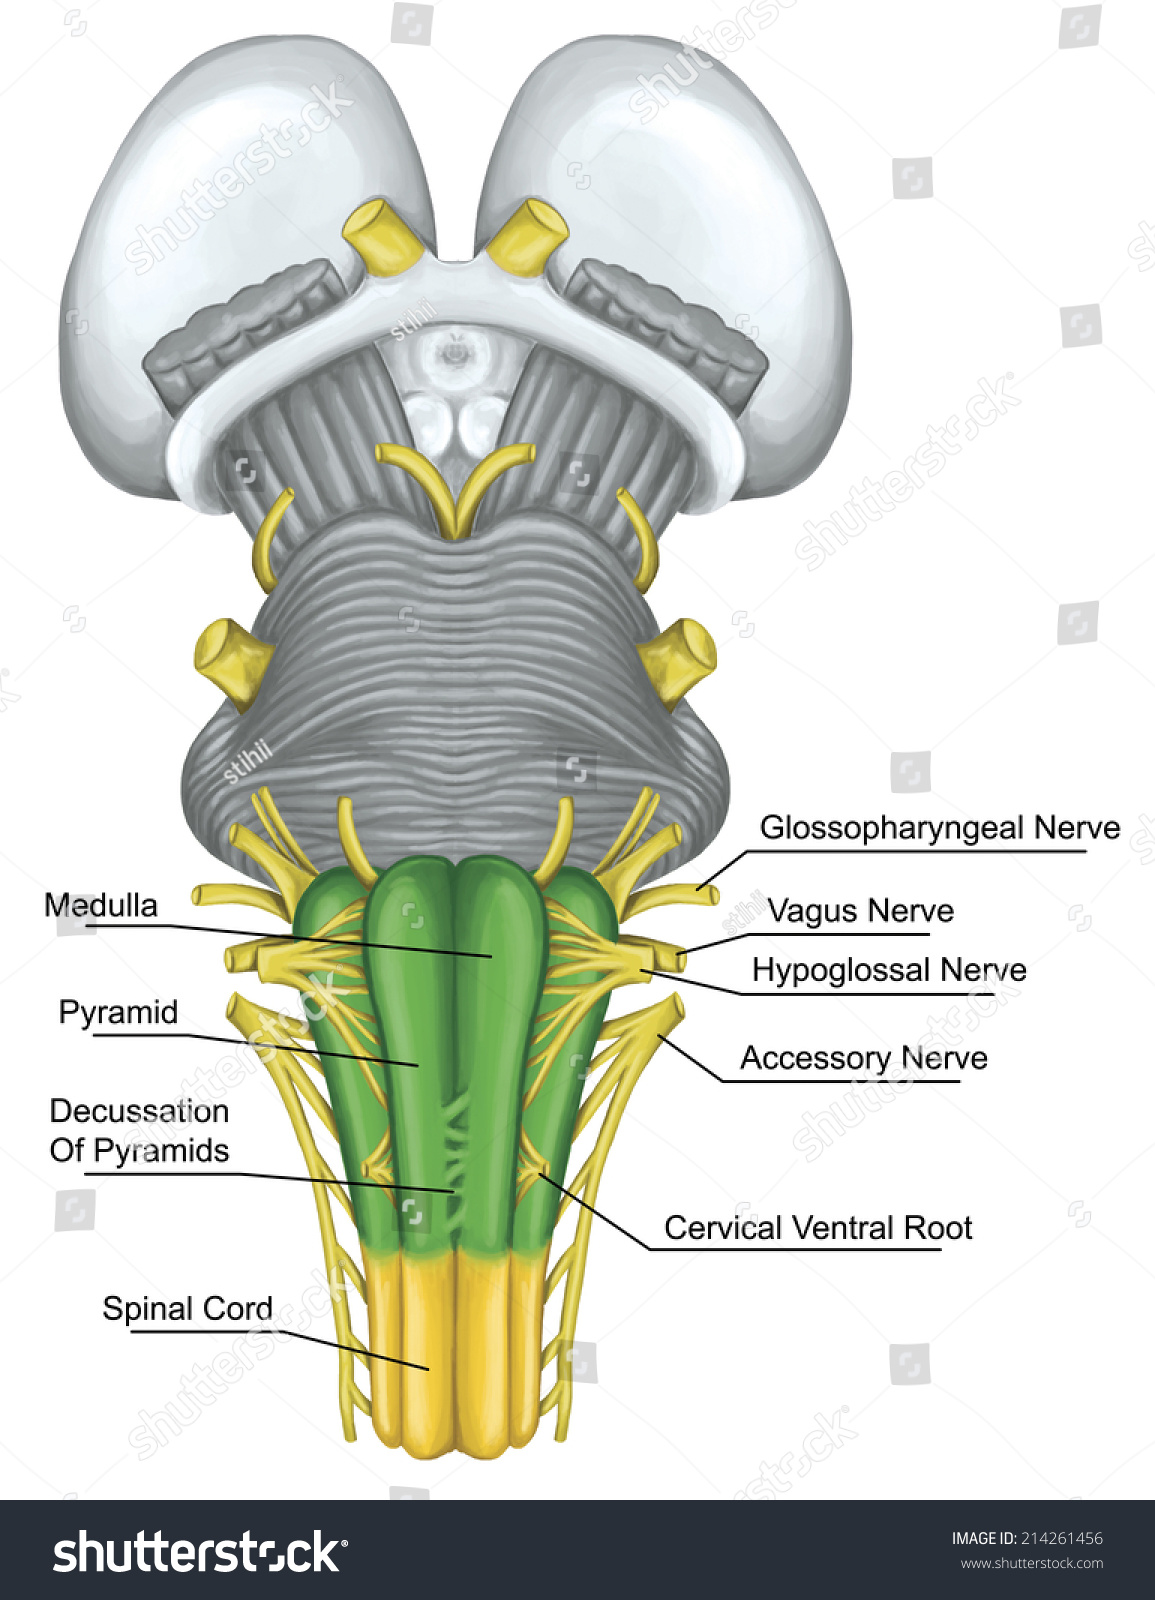 Medulla Brainstem Brain Stem Ventral View Stockillustration